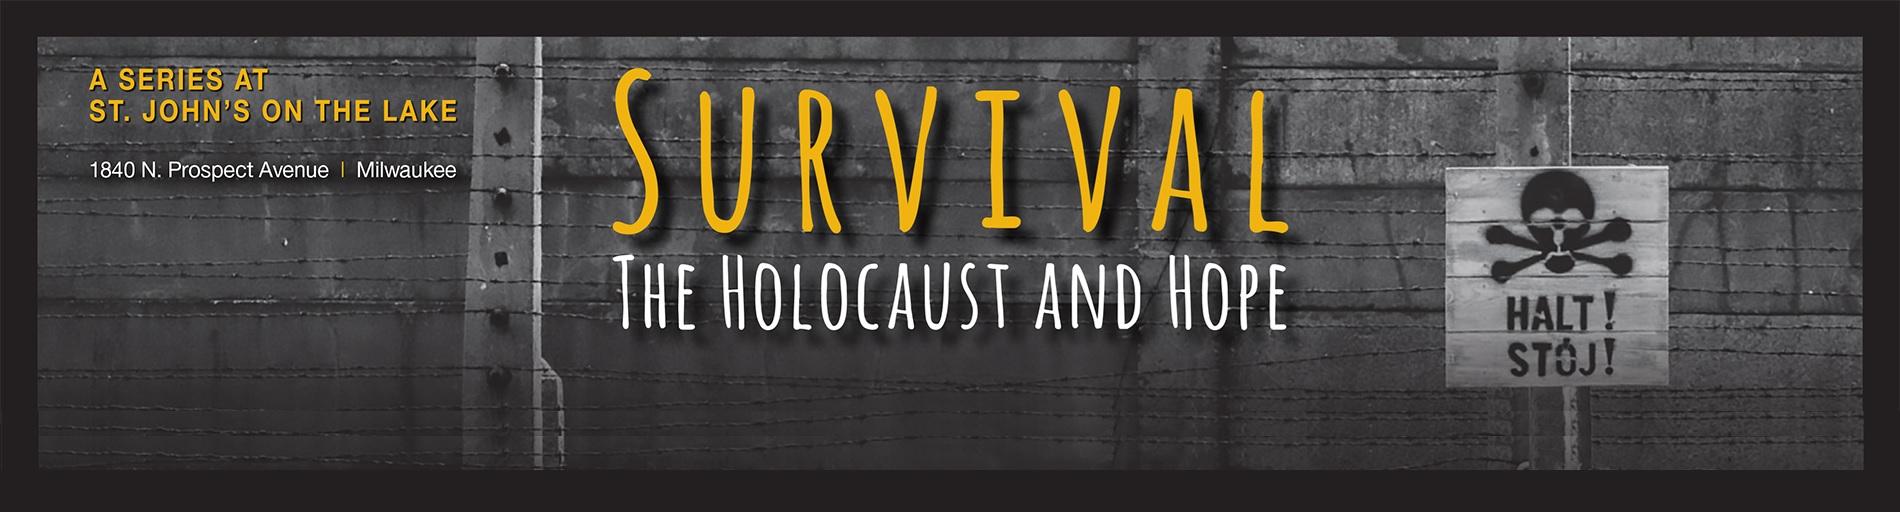 Survival: The Holocaust & Hope Series